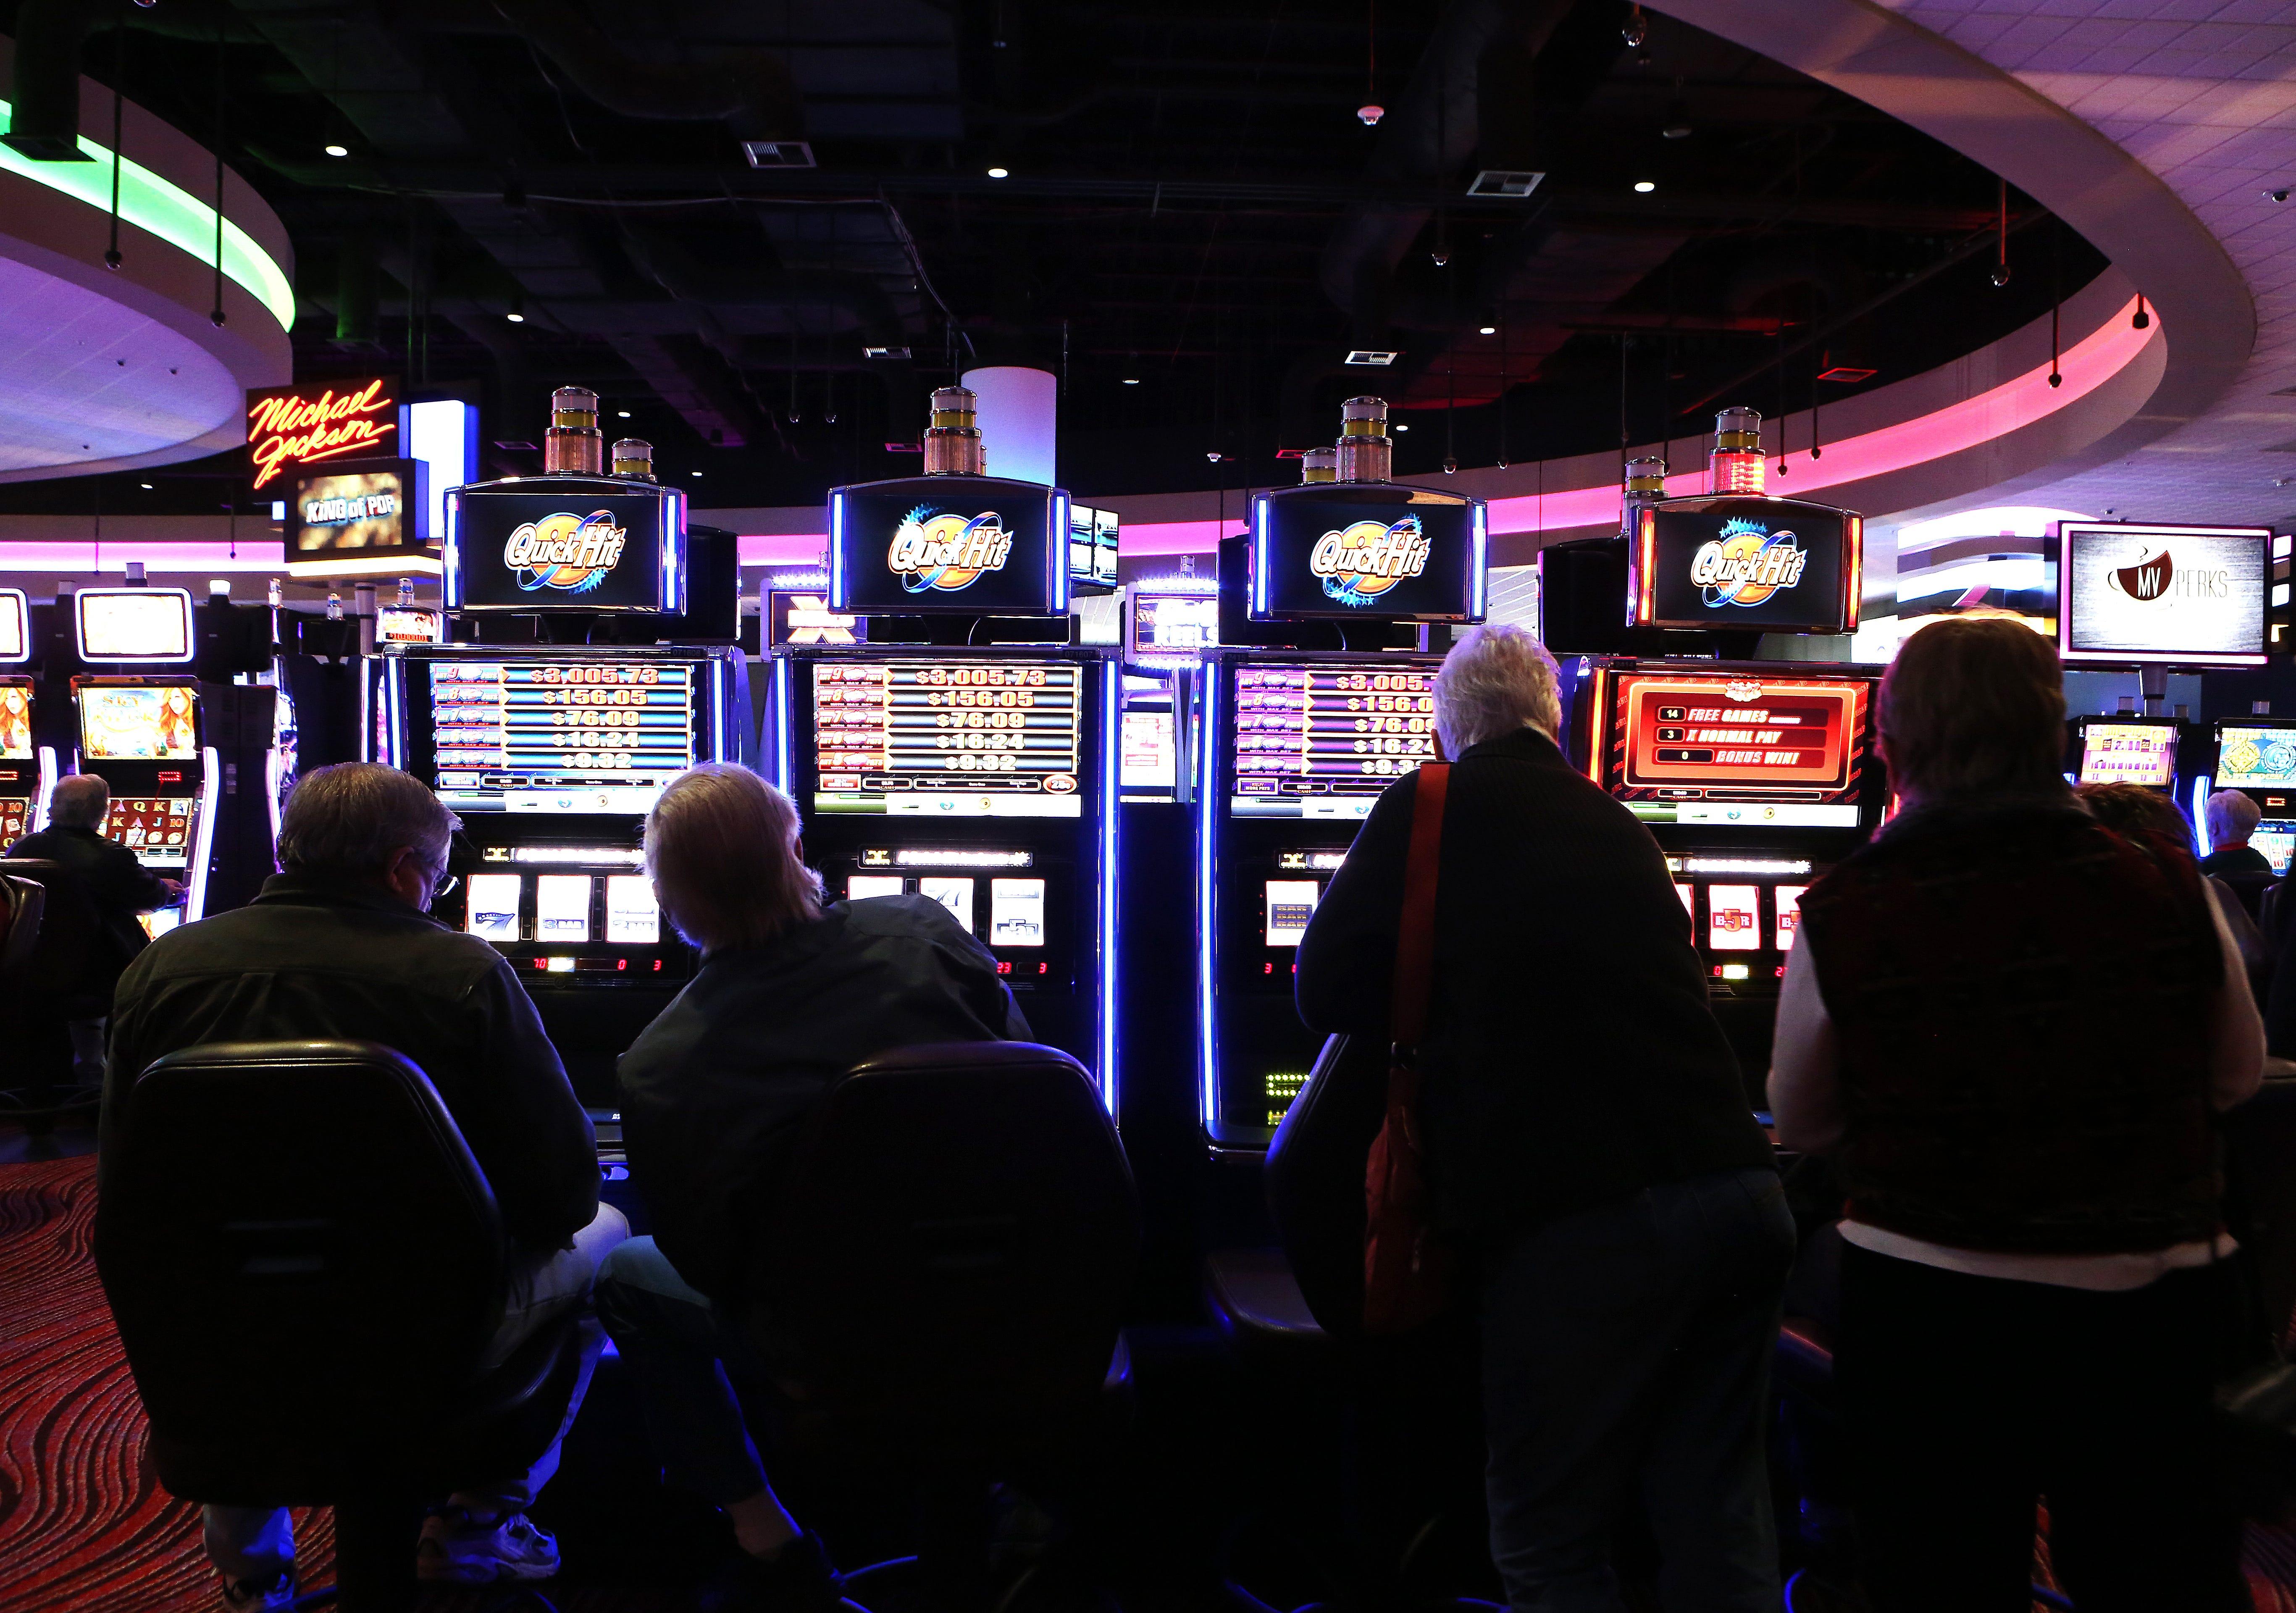 Benefits of casino gambling in kentucky casino echelon hotel